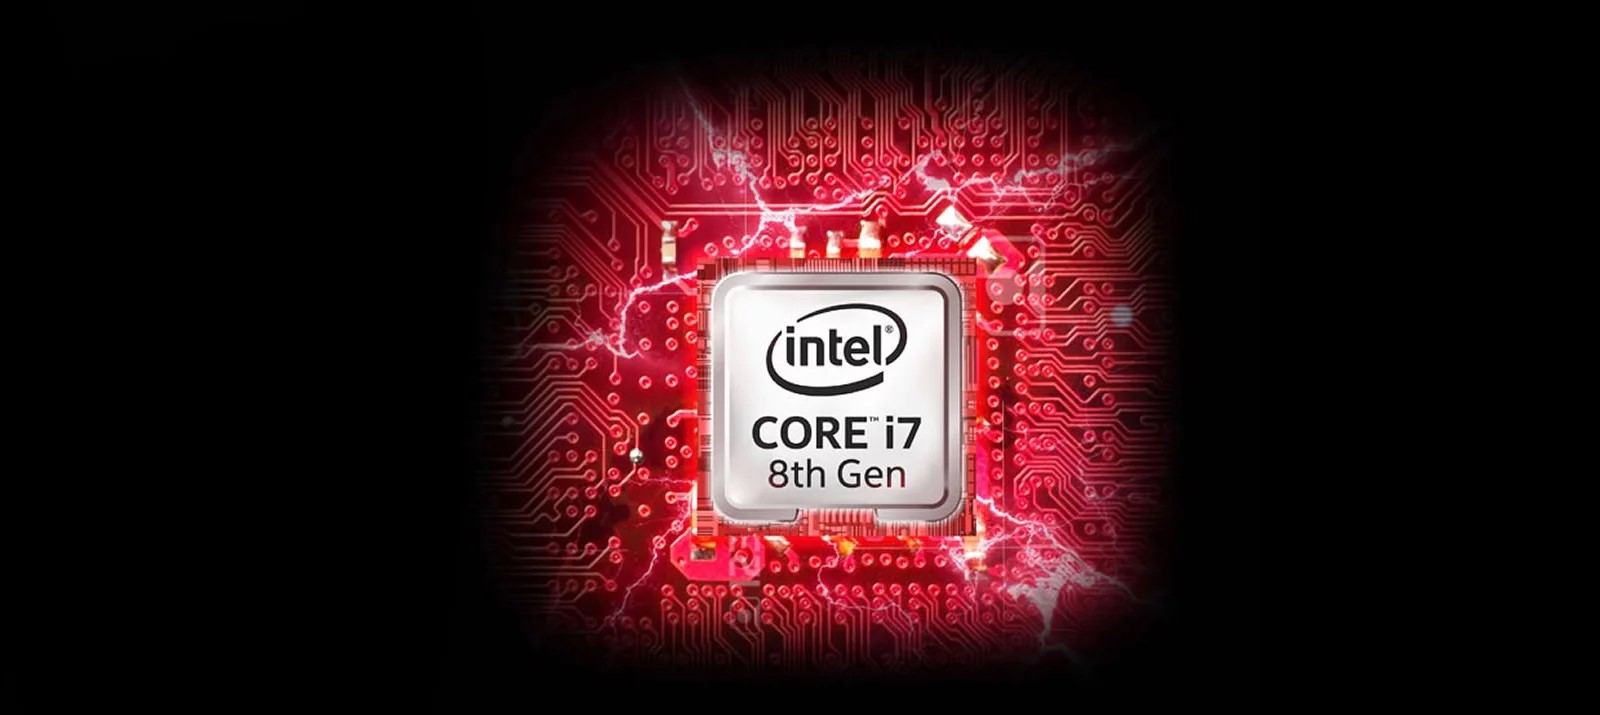 CLEVO P960EF Intel Core i7-8750H Coffee Lake | Metal Chassis